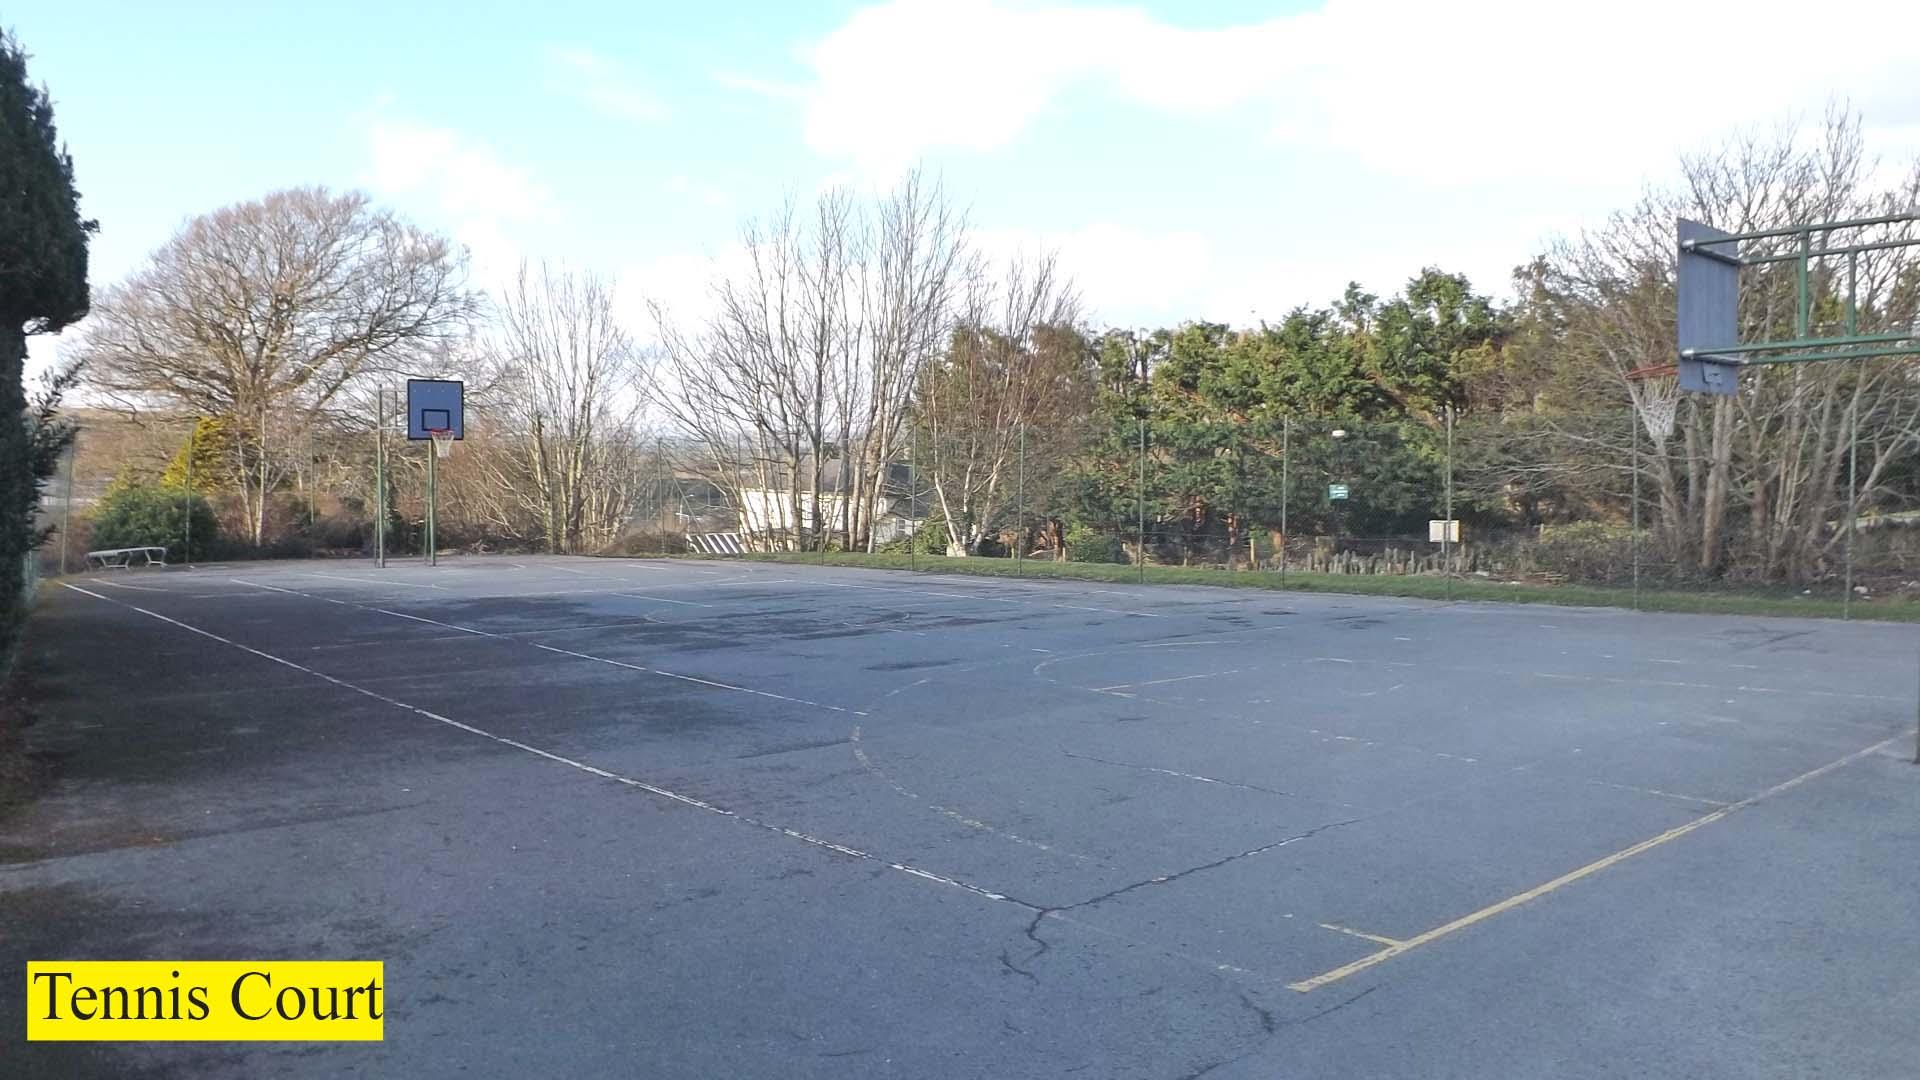 pic 5 Tennis Court